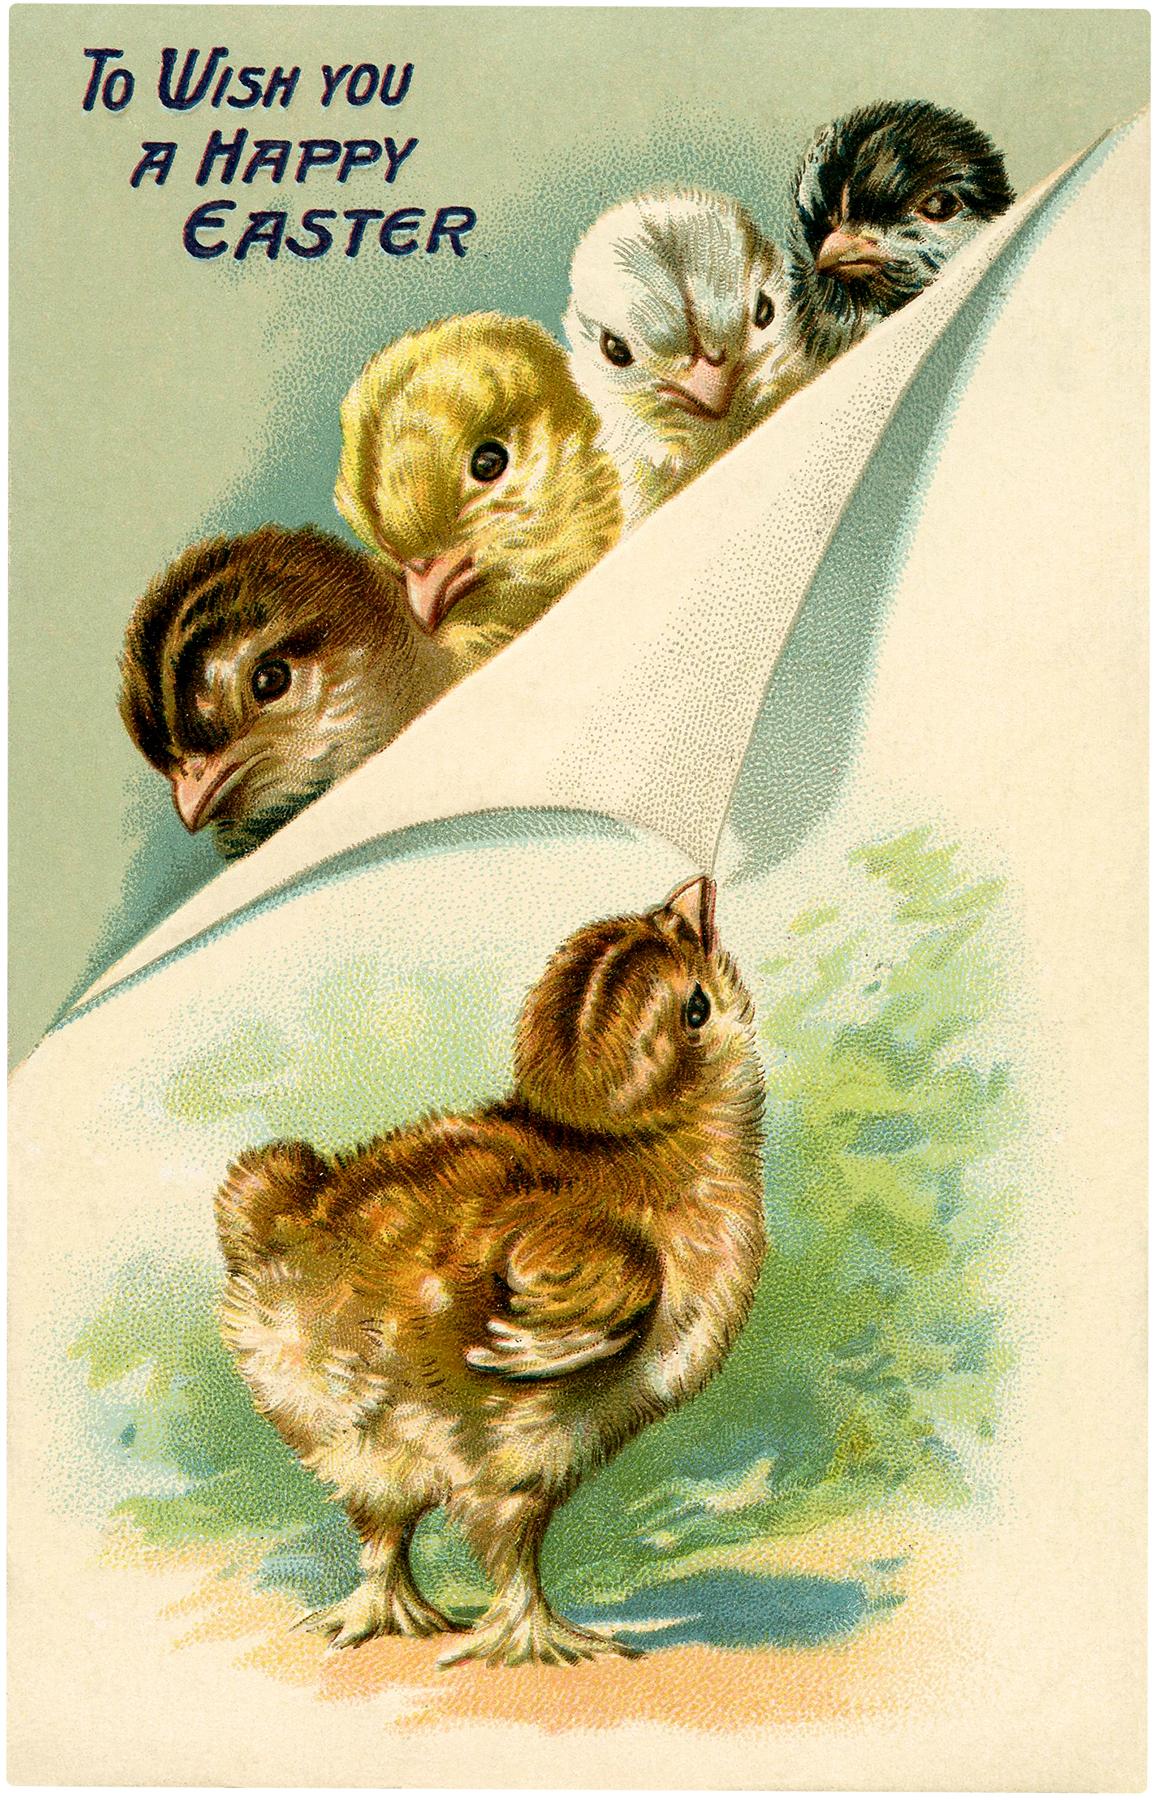 Cute Baby Chicks Image